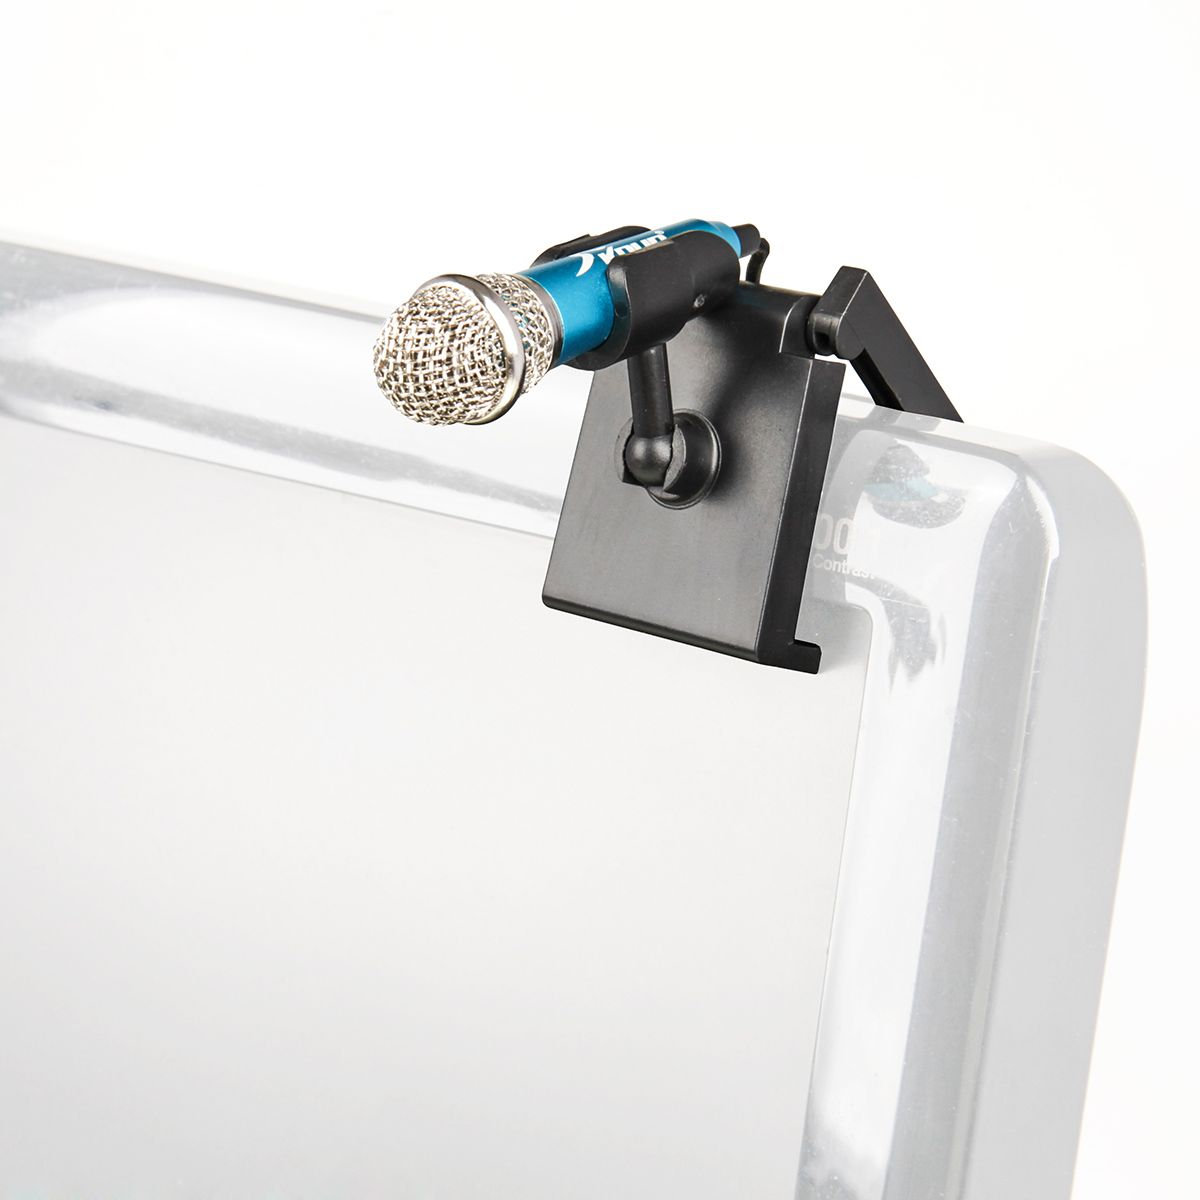 Microfone p/ Celular Knup kp-907